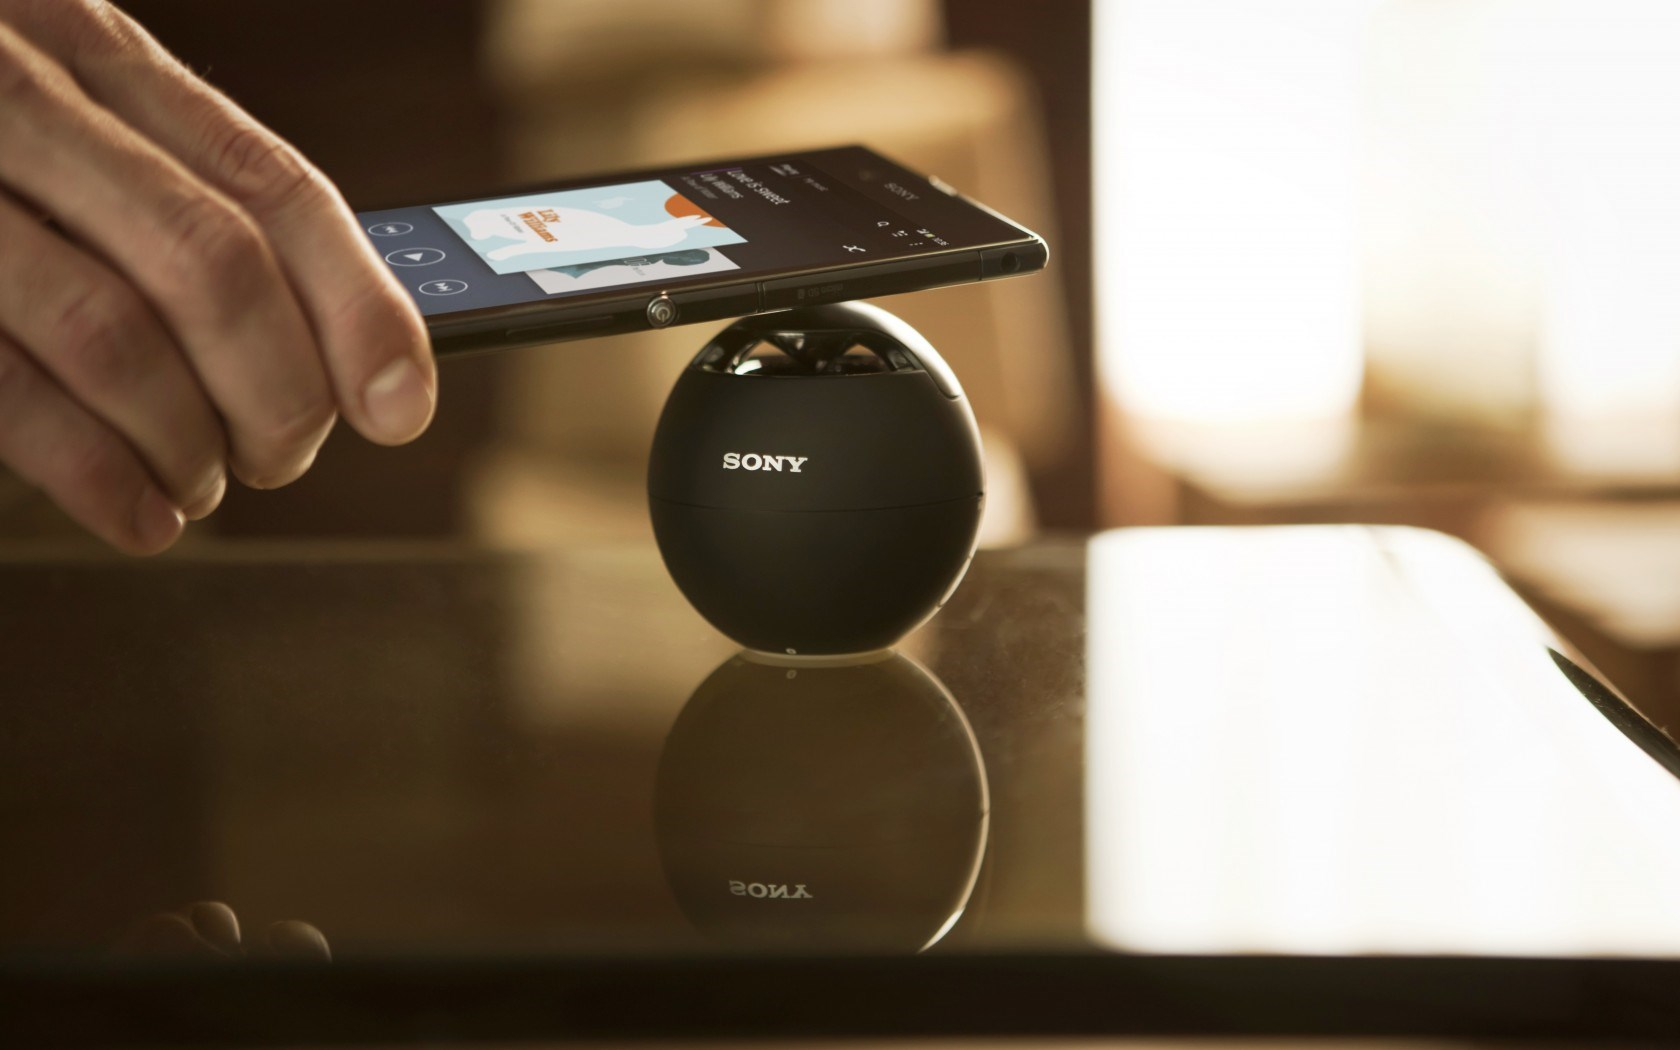 6971194-sony-mobile-xperia-z-ultra